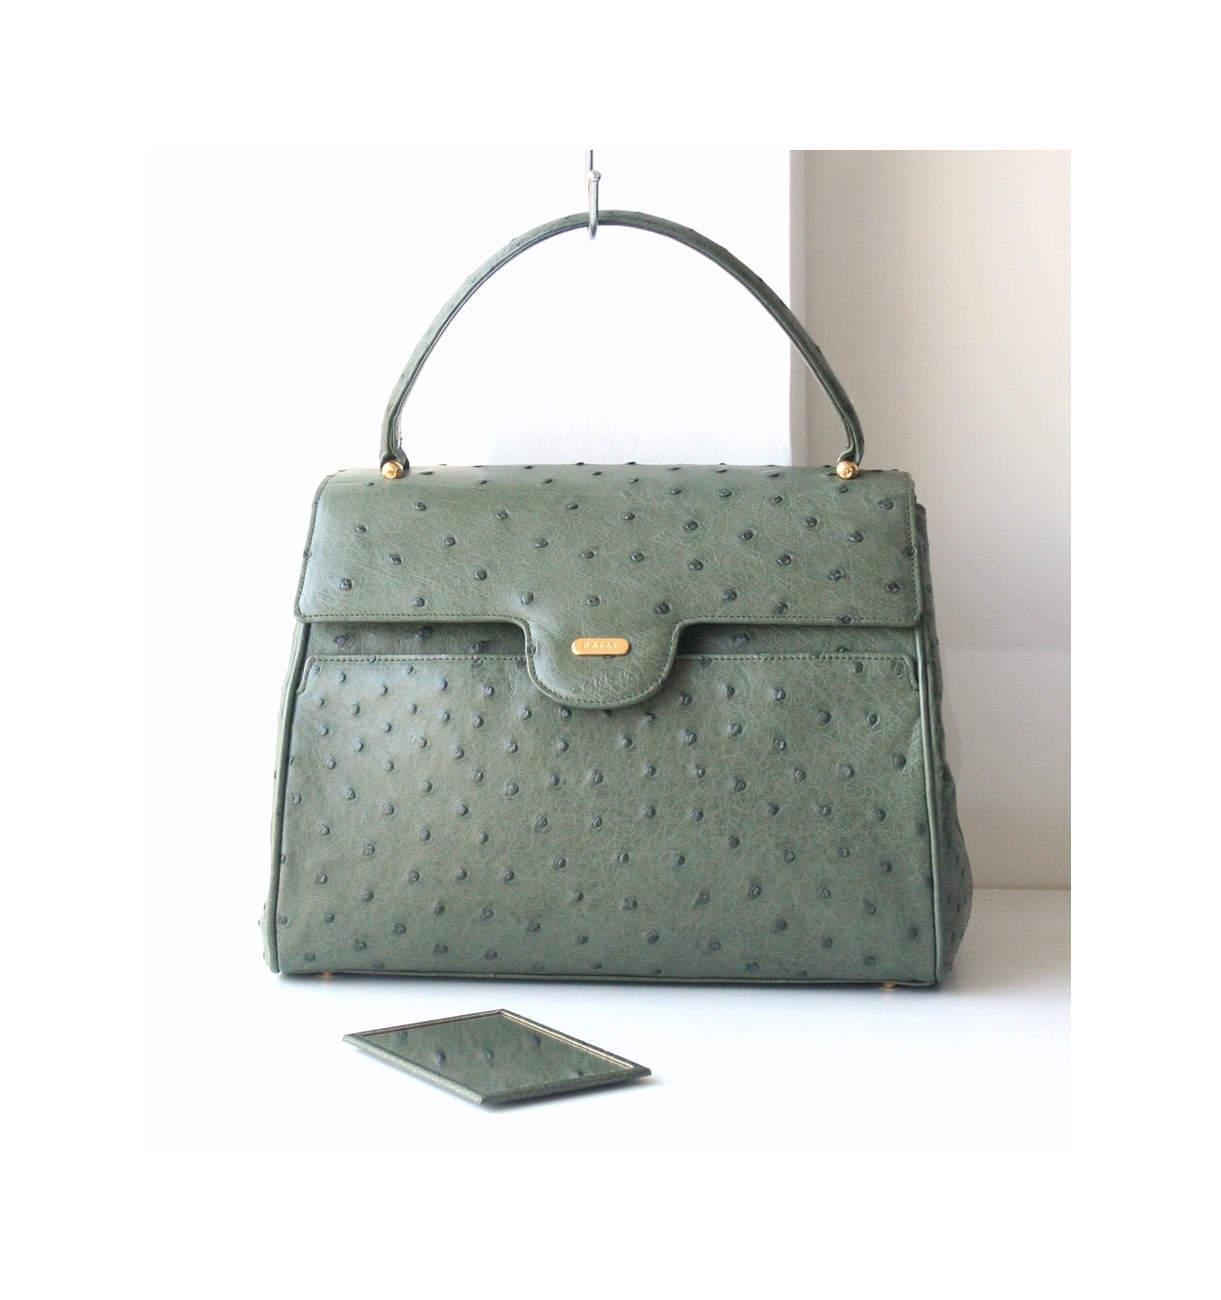 a57d8c2c8322 Bally ostrich leather tote authentic vintage handbag Prestine -  1